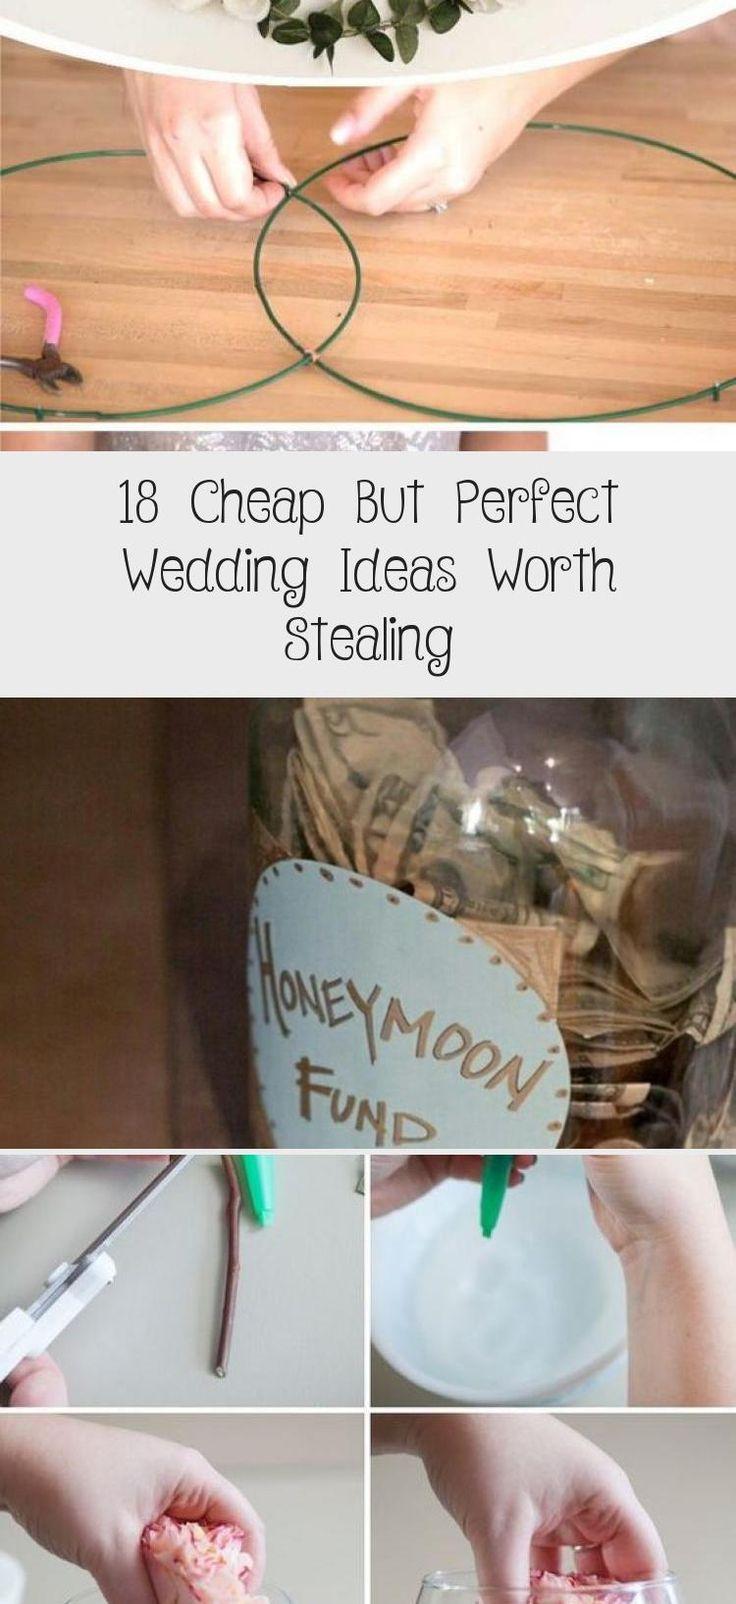 Jan 25, 2020 - 18 #Cheap But Perfect #Wedding Ideas Worth Stealing!